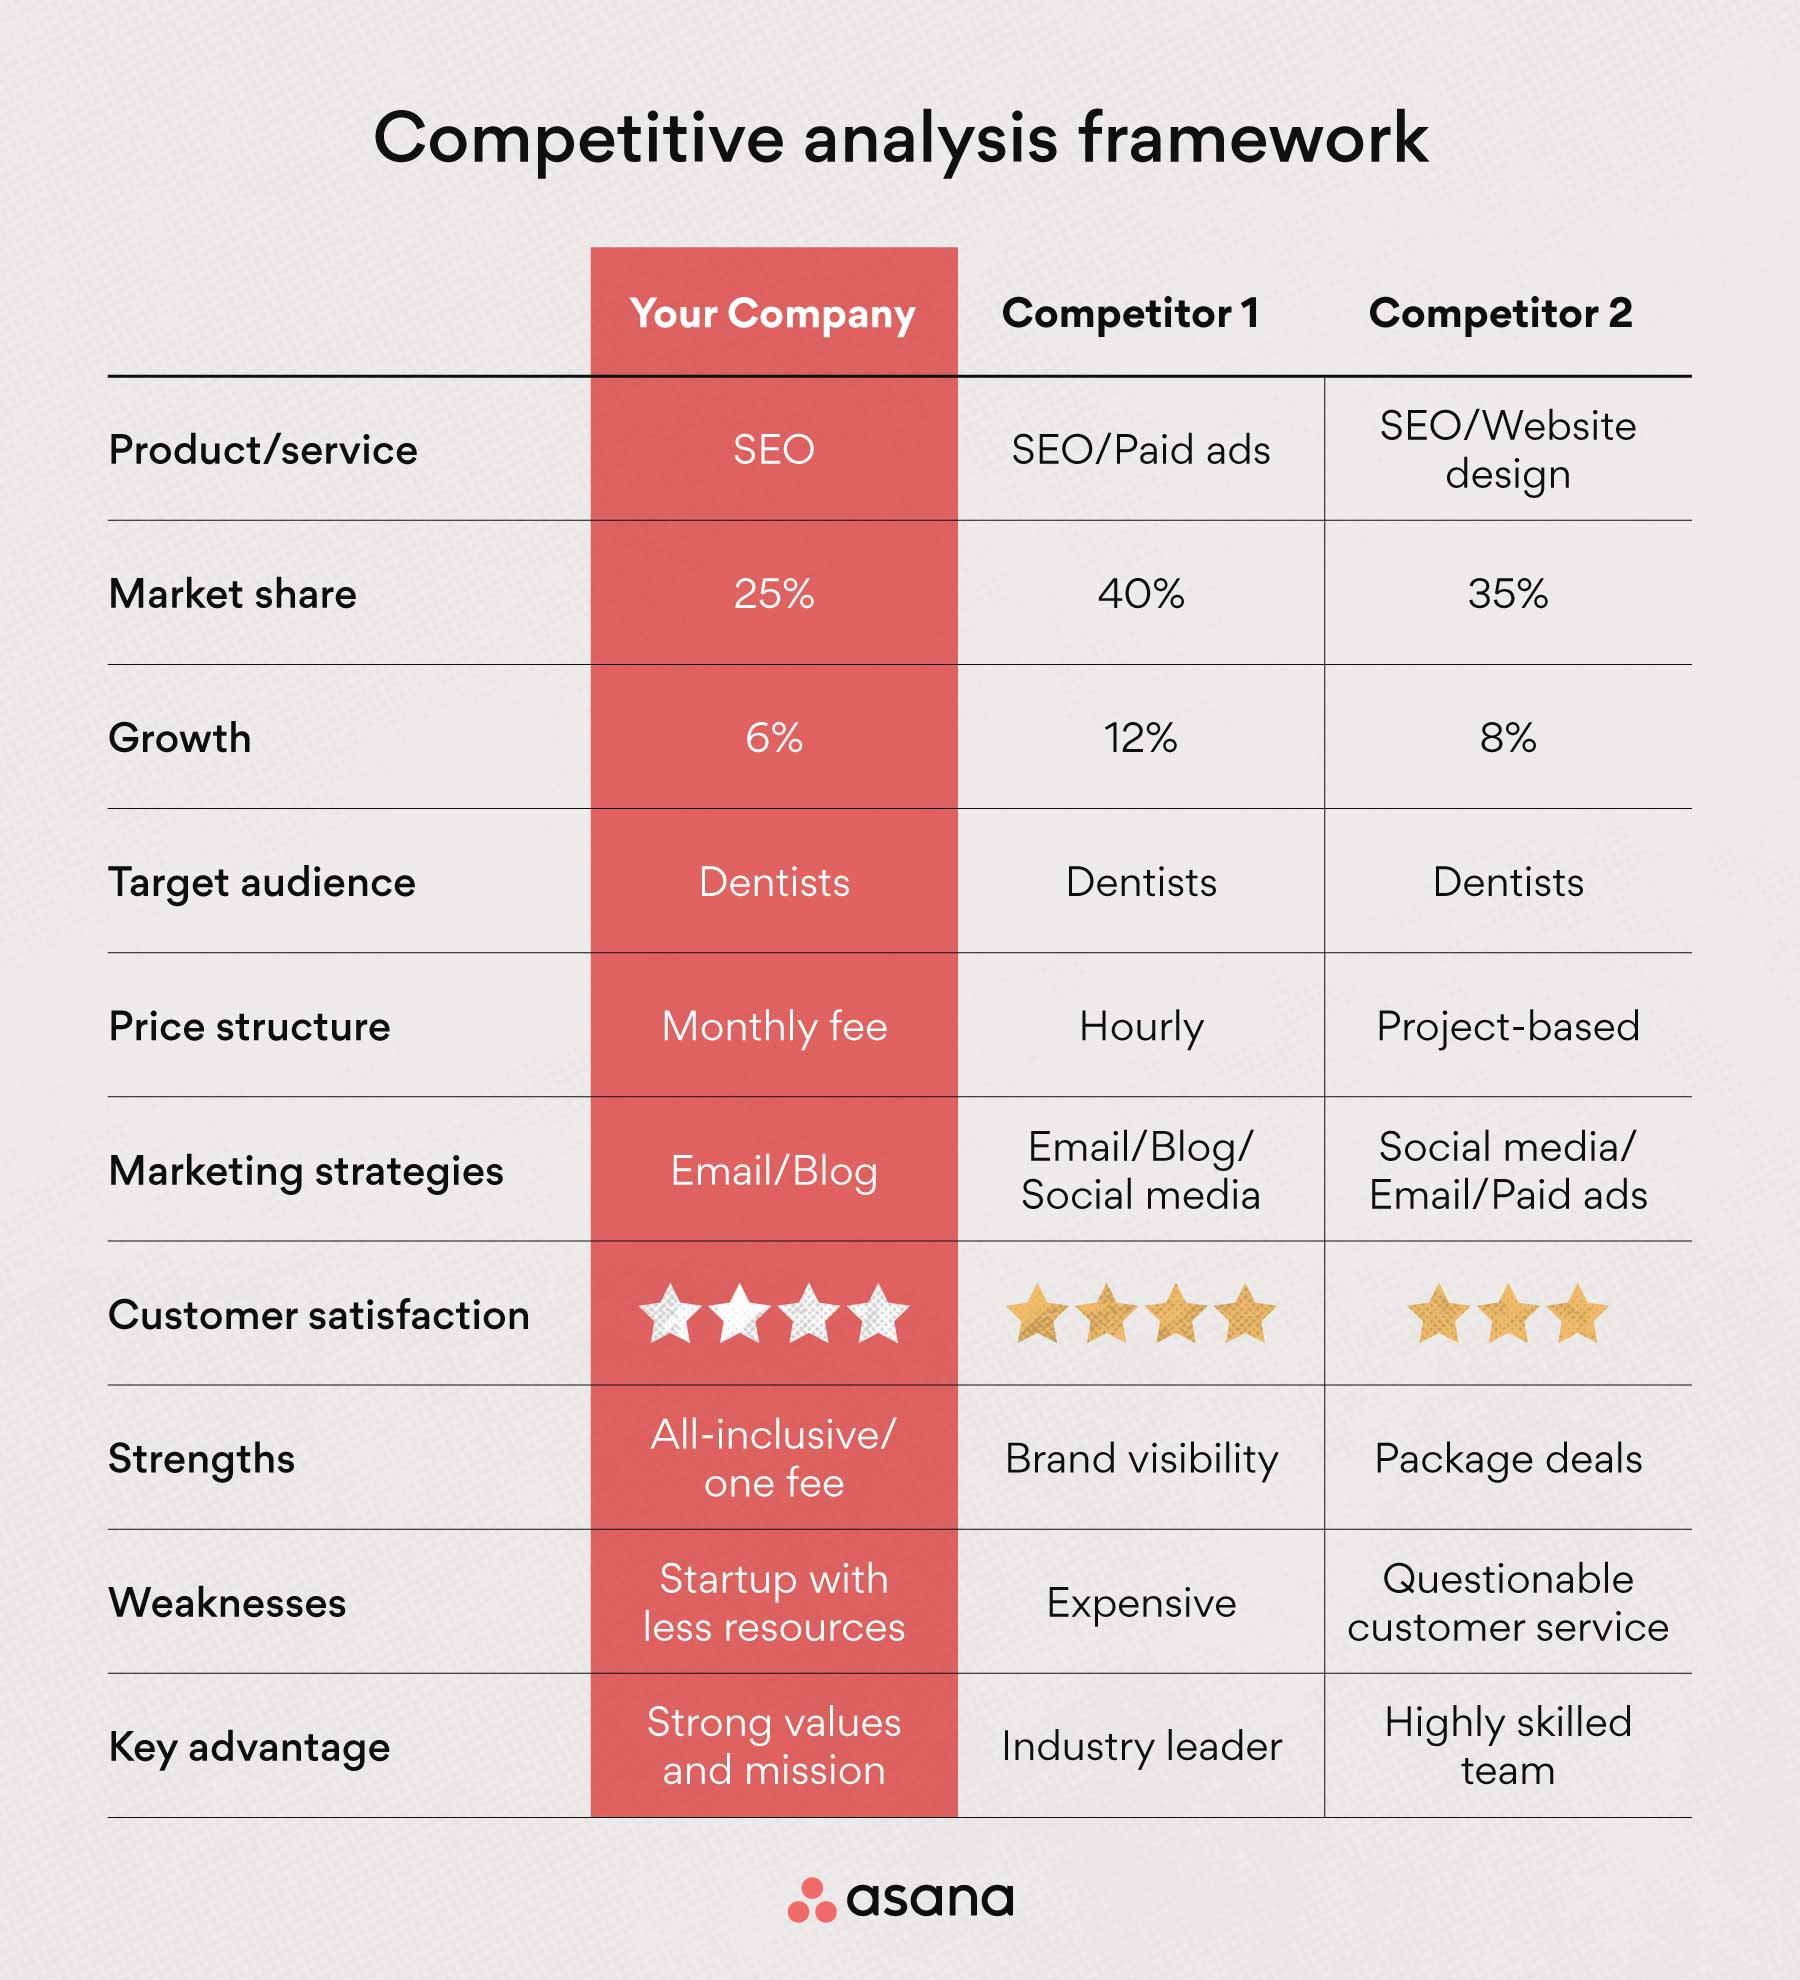 Competitive analysis framework